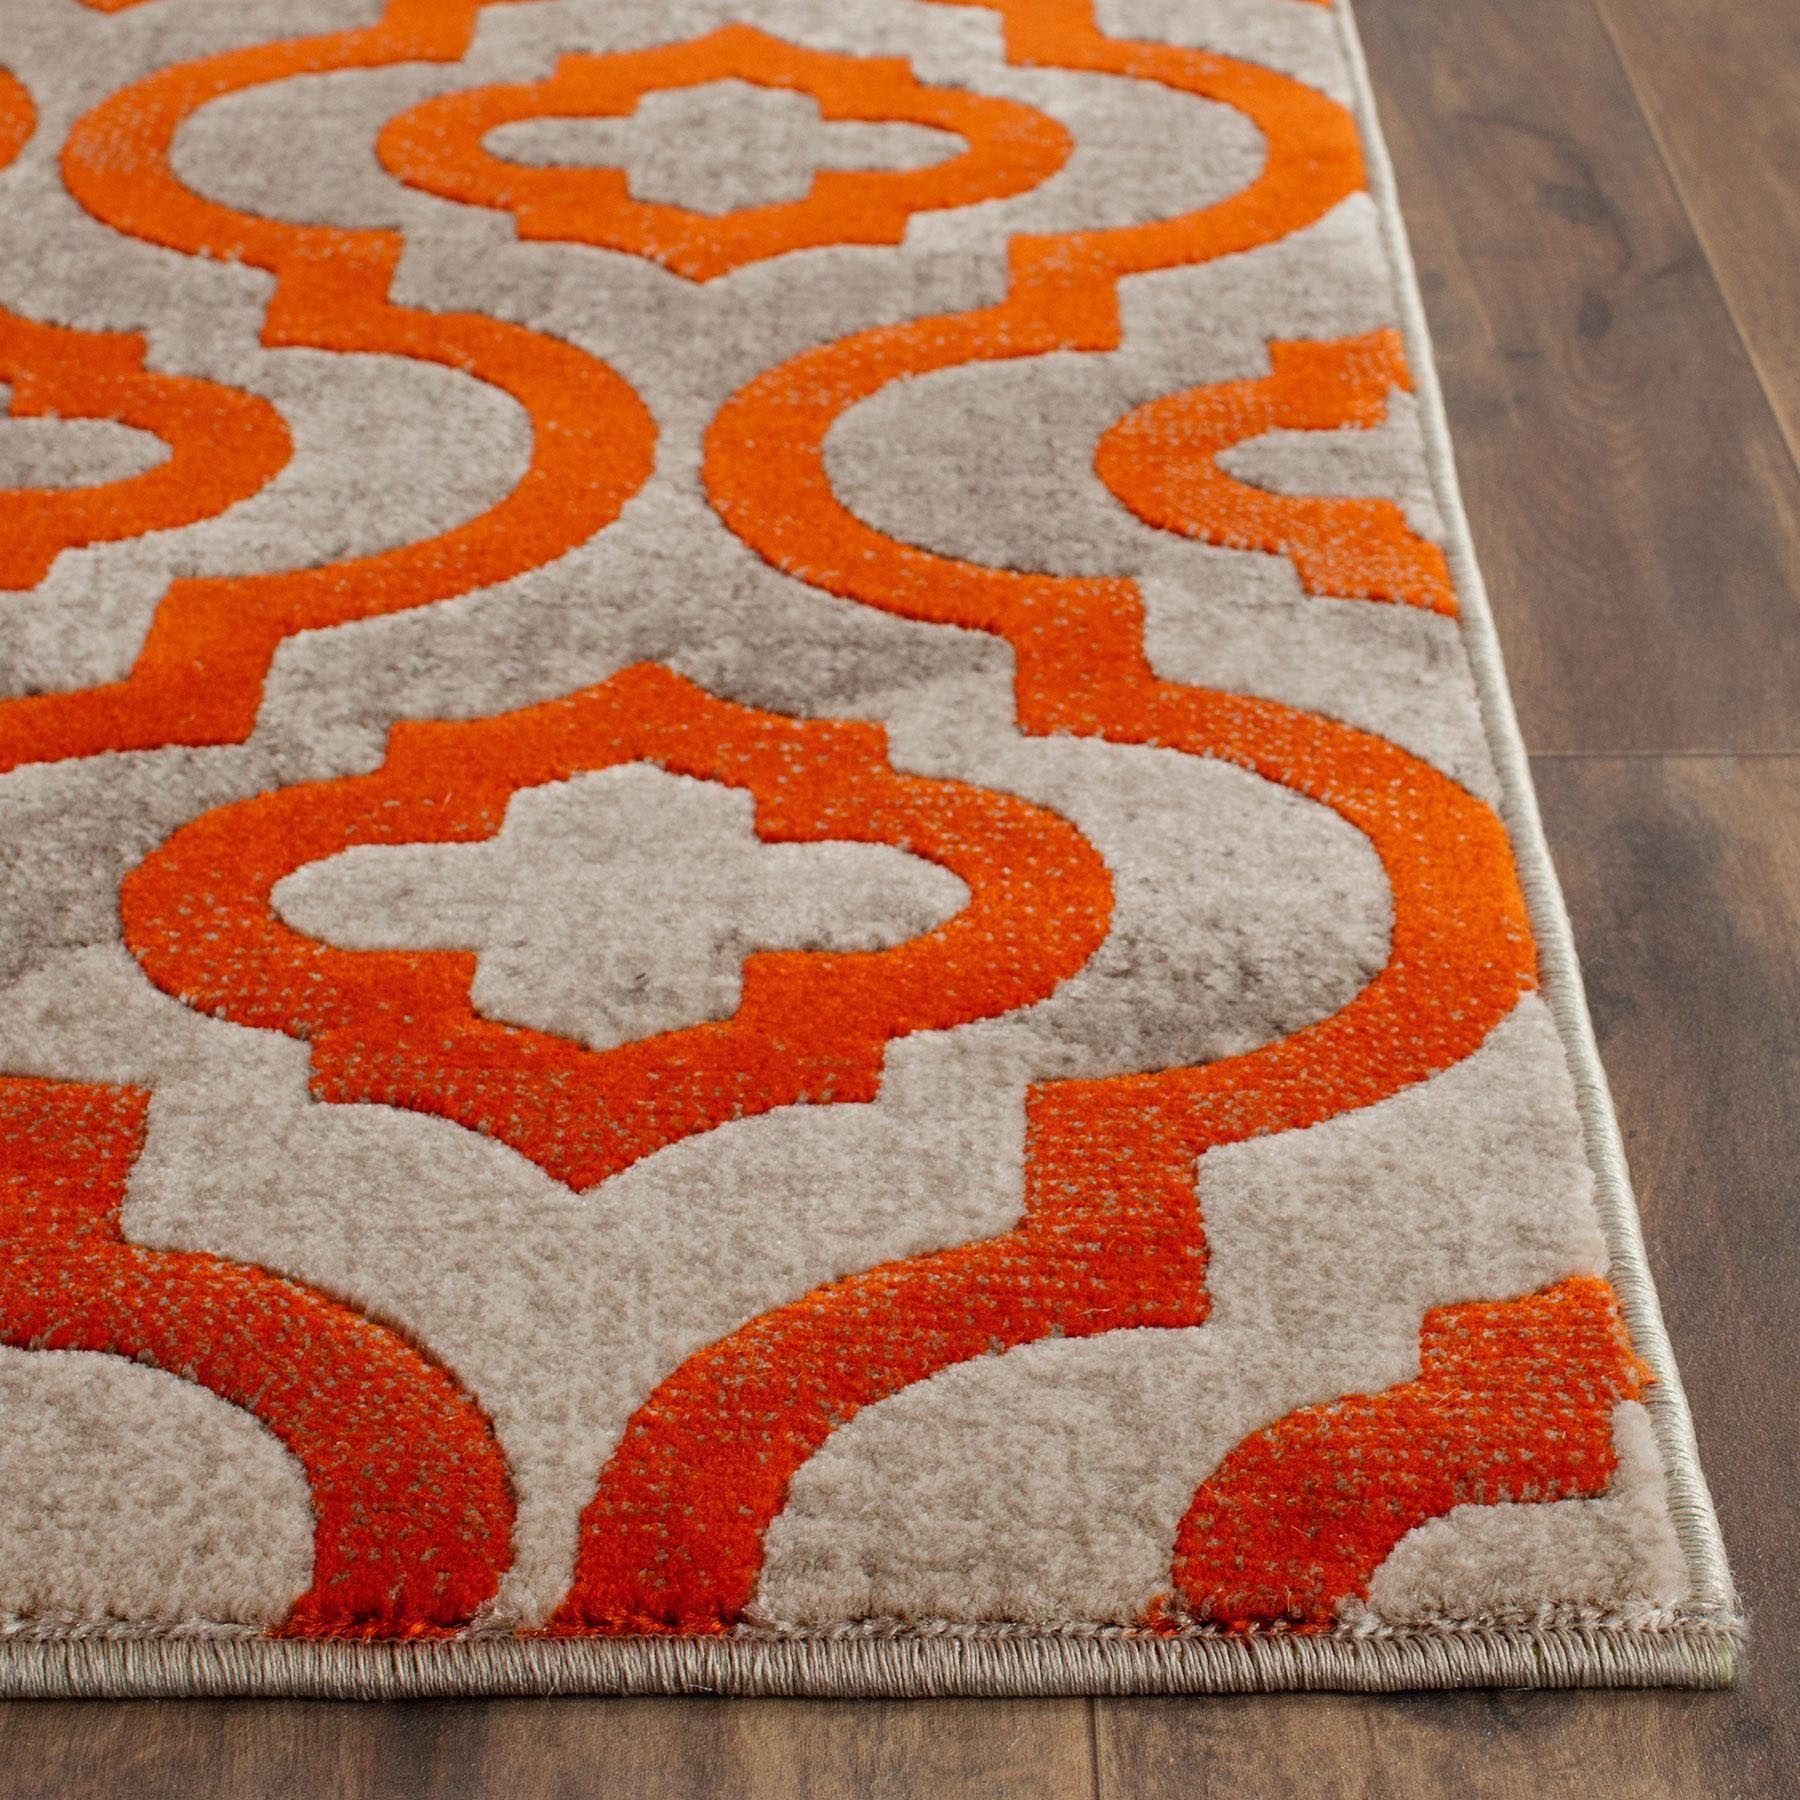 grey and orange area rug  narancs szürke  pinterest  orange  - grey and orange area rug